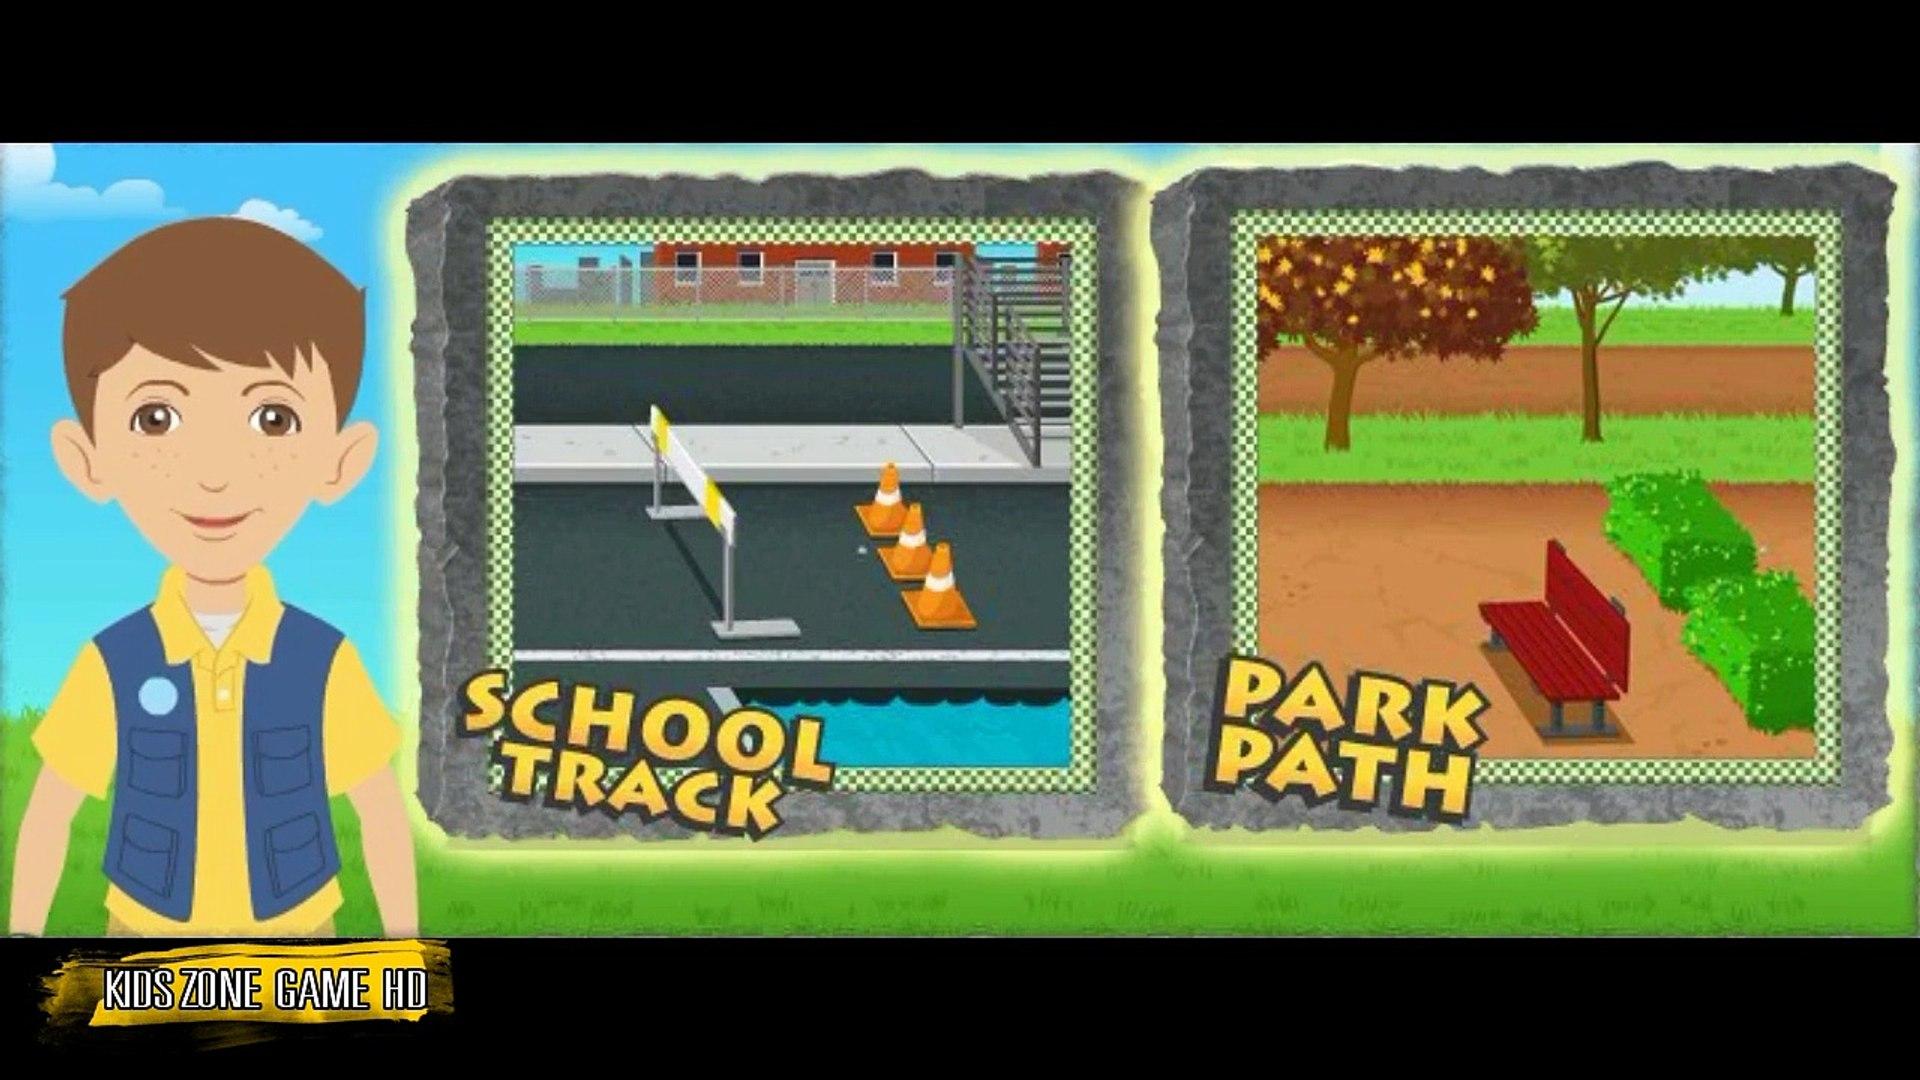 Dino Dan - Dinosaur Game for Kids for Kids - Kids for Kids Game Play Show Cartoon